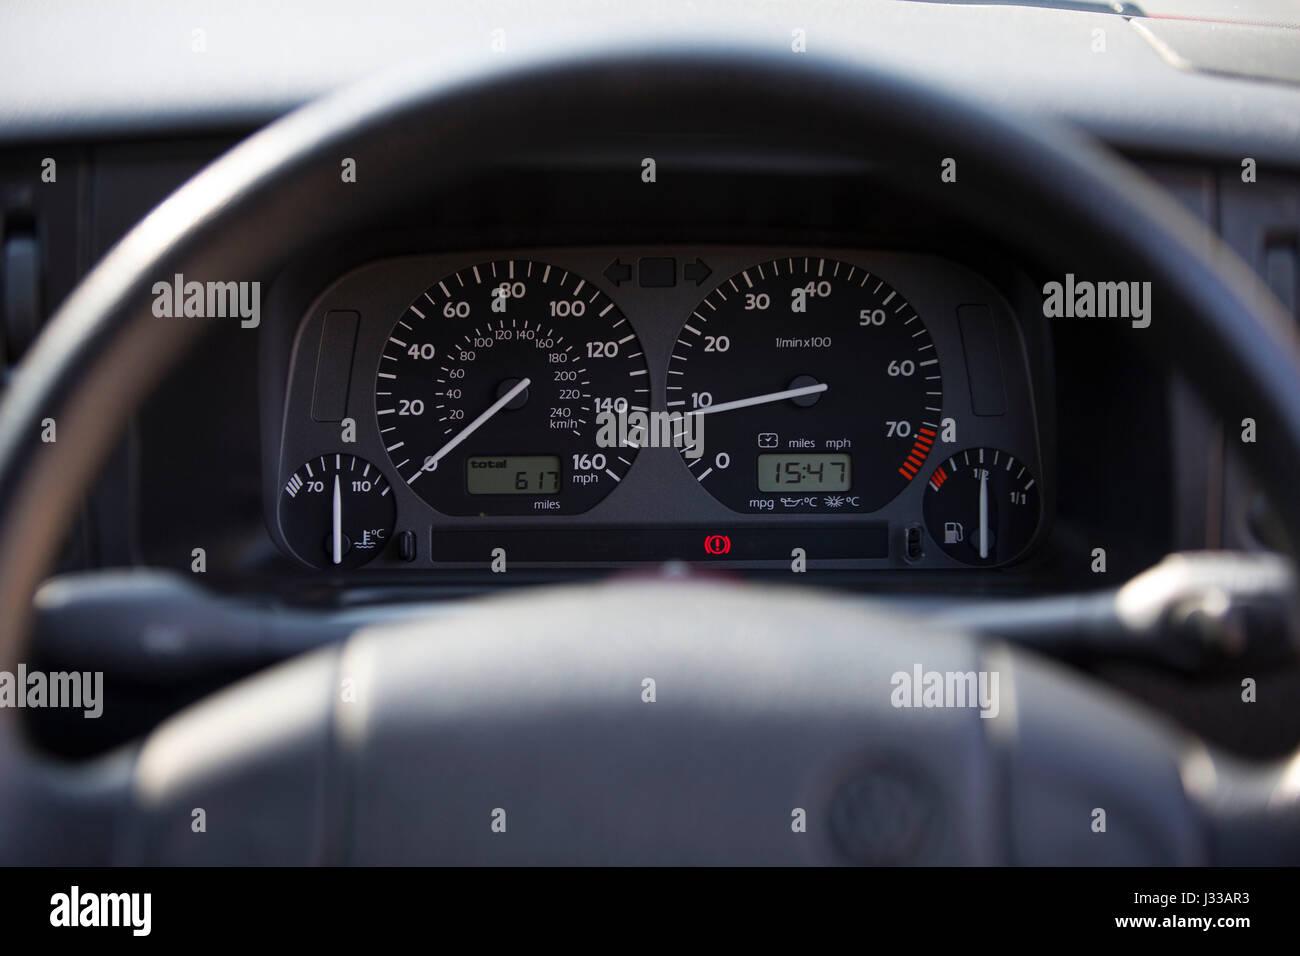 PHOTO:JEFF GILBERT. 05.04.2017 Longcross Testing Circuit, Chobham Race Track, Surrey, England. Volkswagen Golf GTi - Stock Image